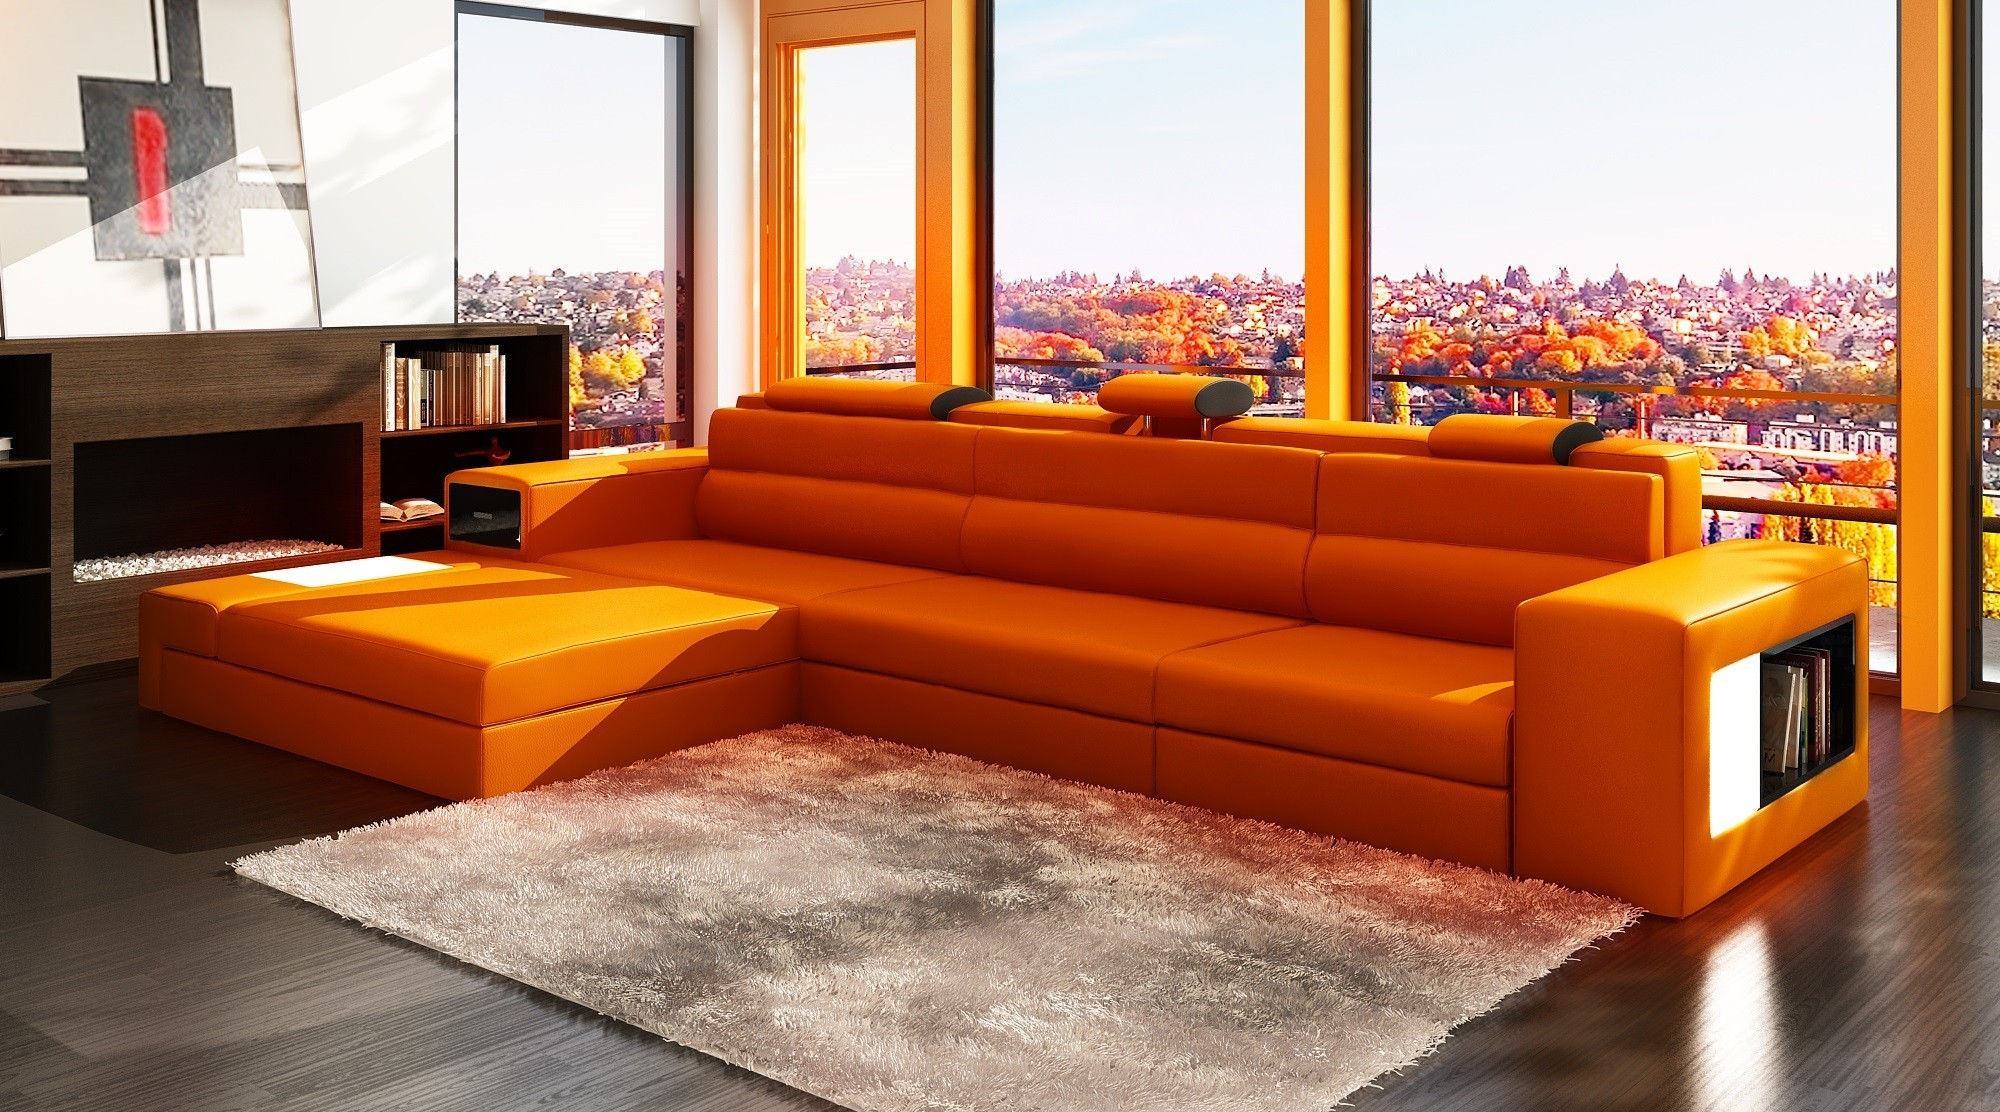 top floor living room bold orange recliners soft fur carpet wooden